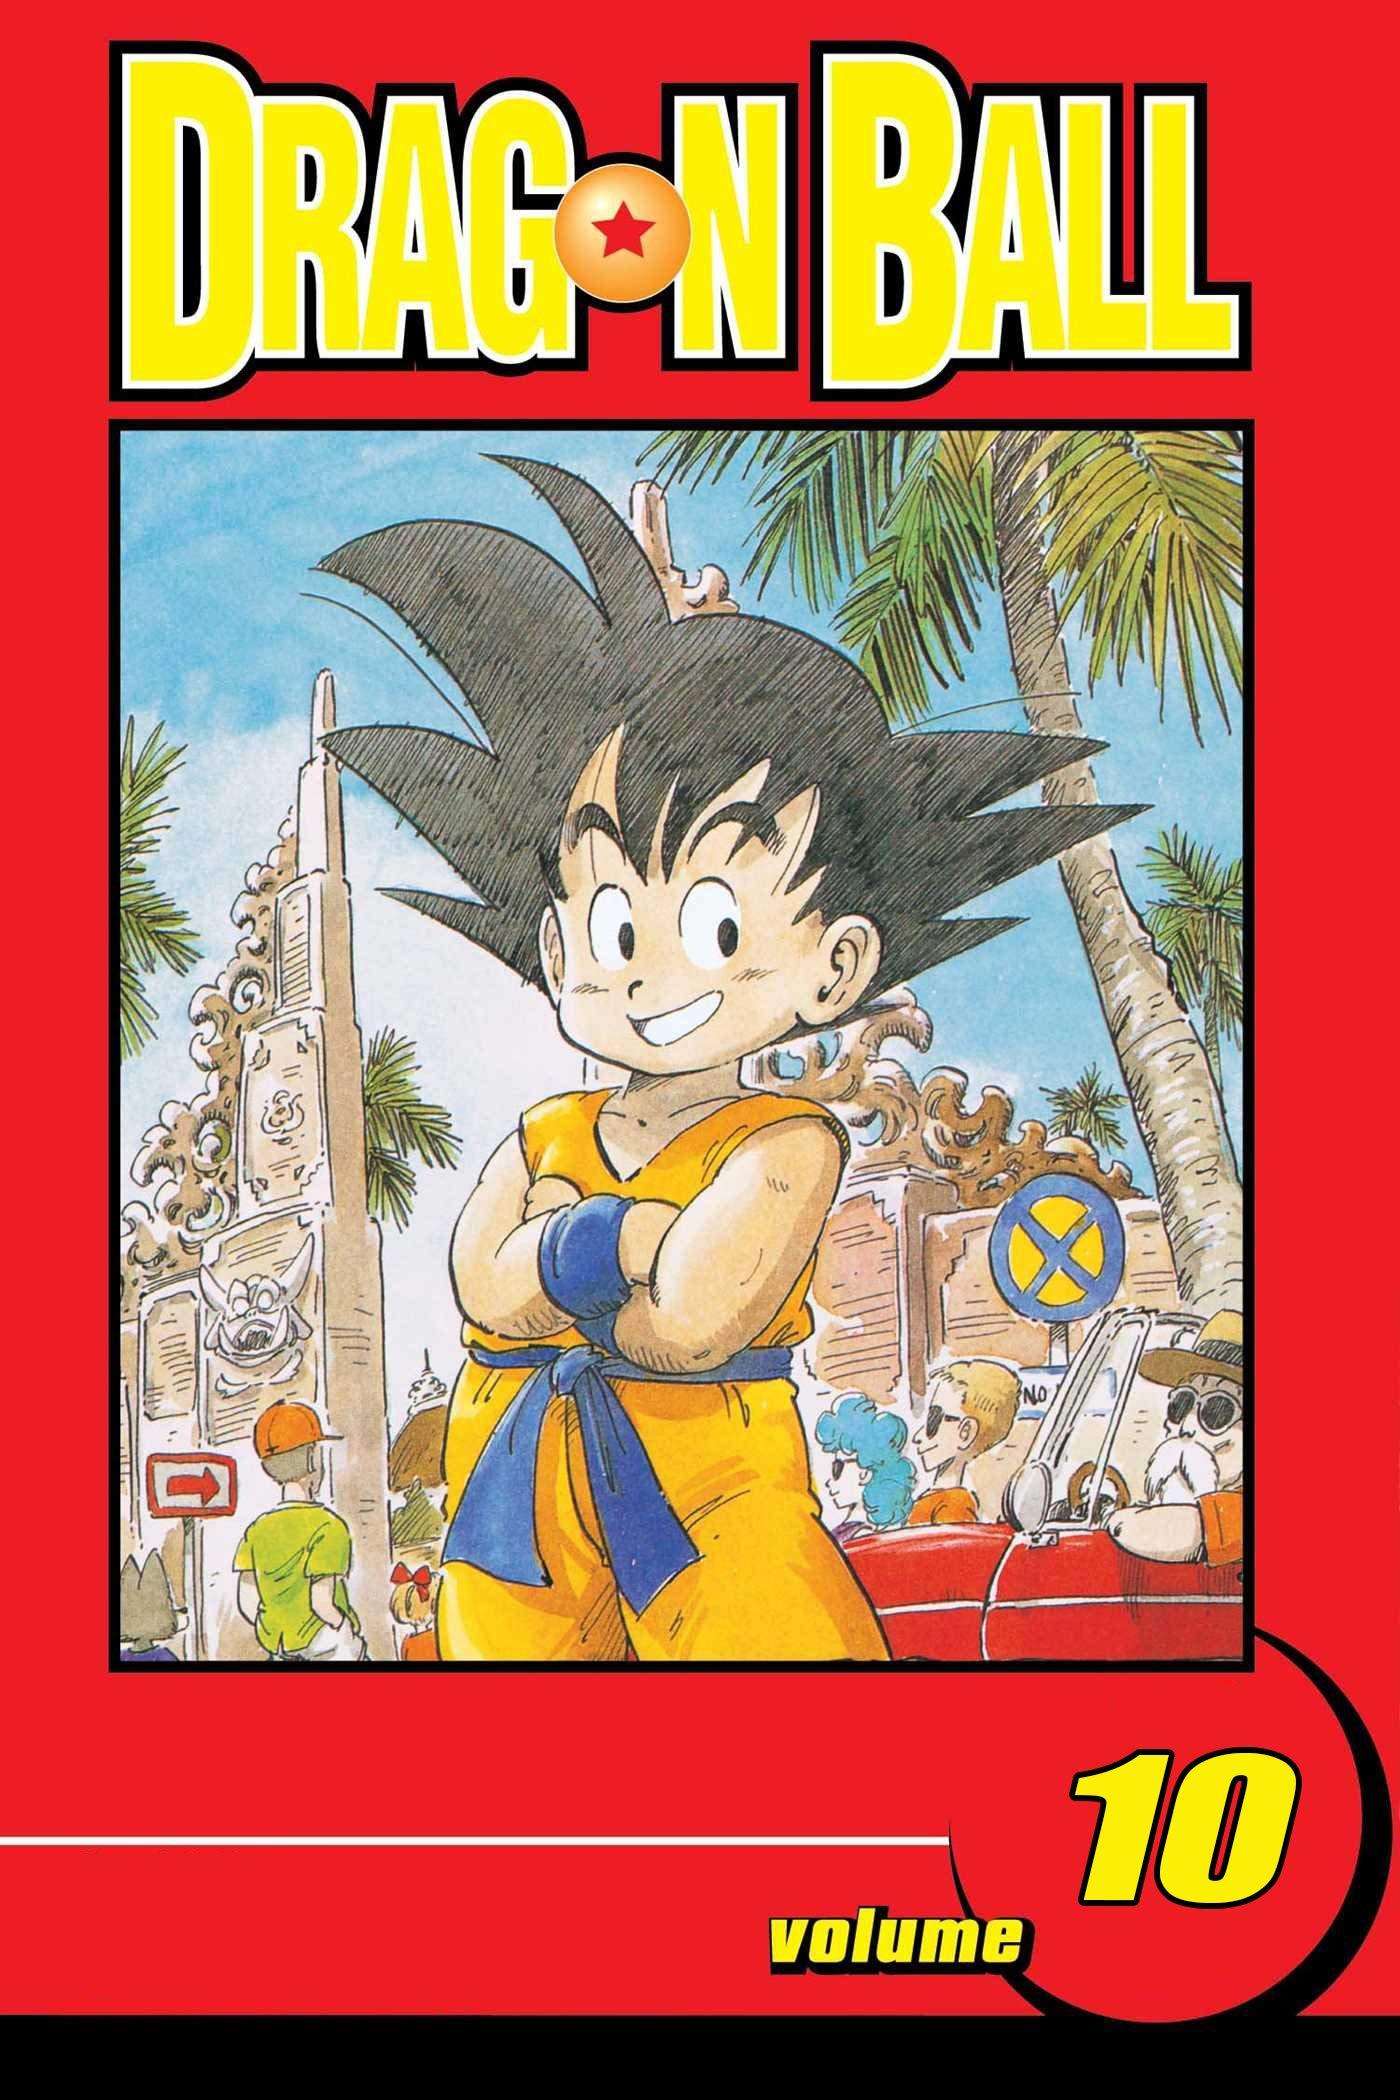 Dragon Ball Full series: Manga volume 10